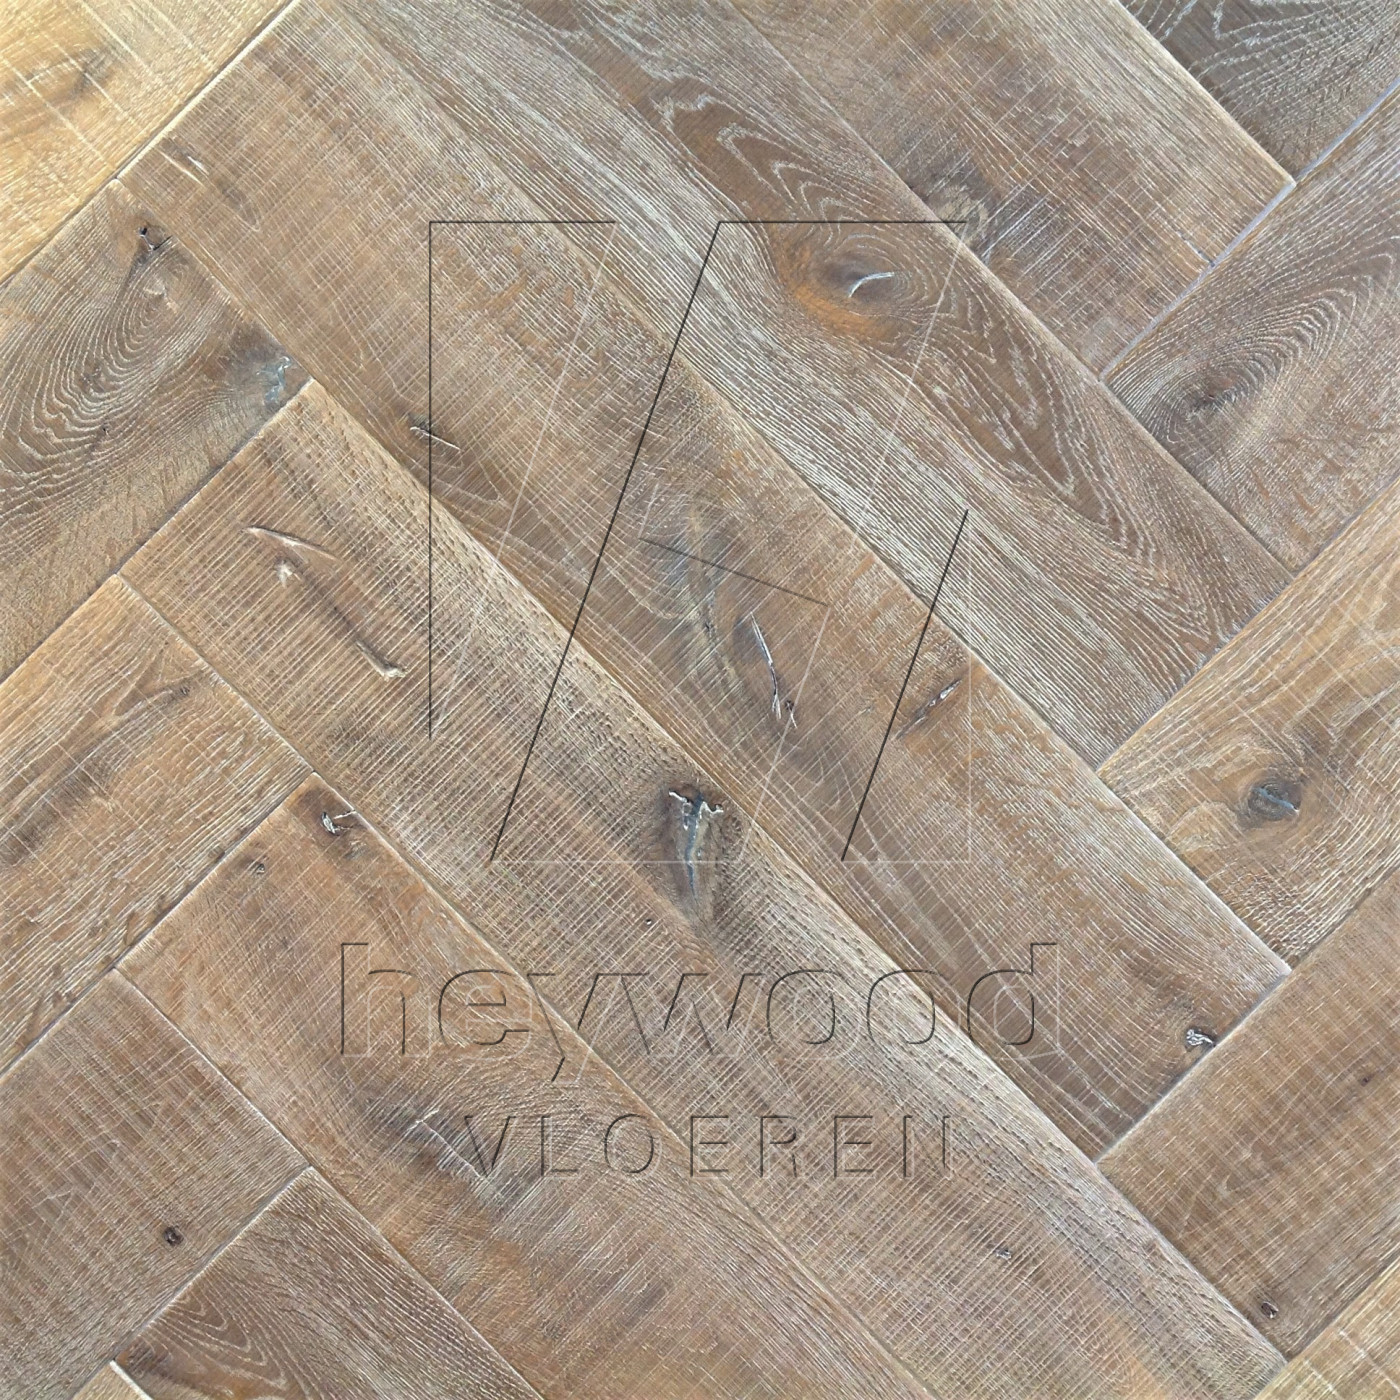 Knotting Hill Herringbone 'Gotland' in Herringbone of Pattern & Panel Floors